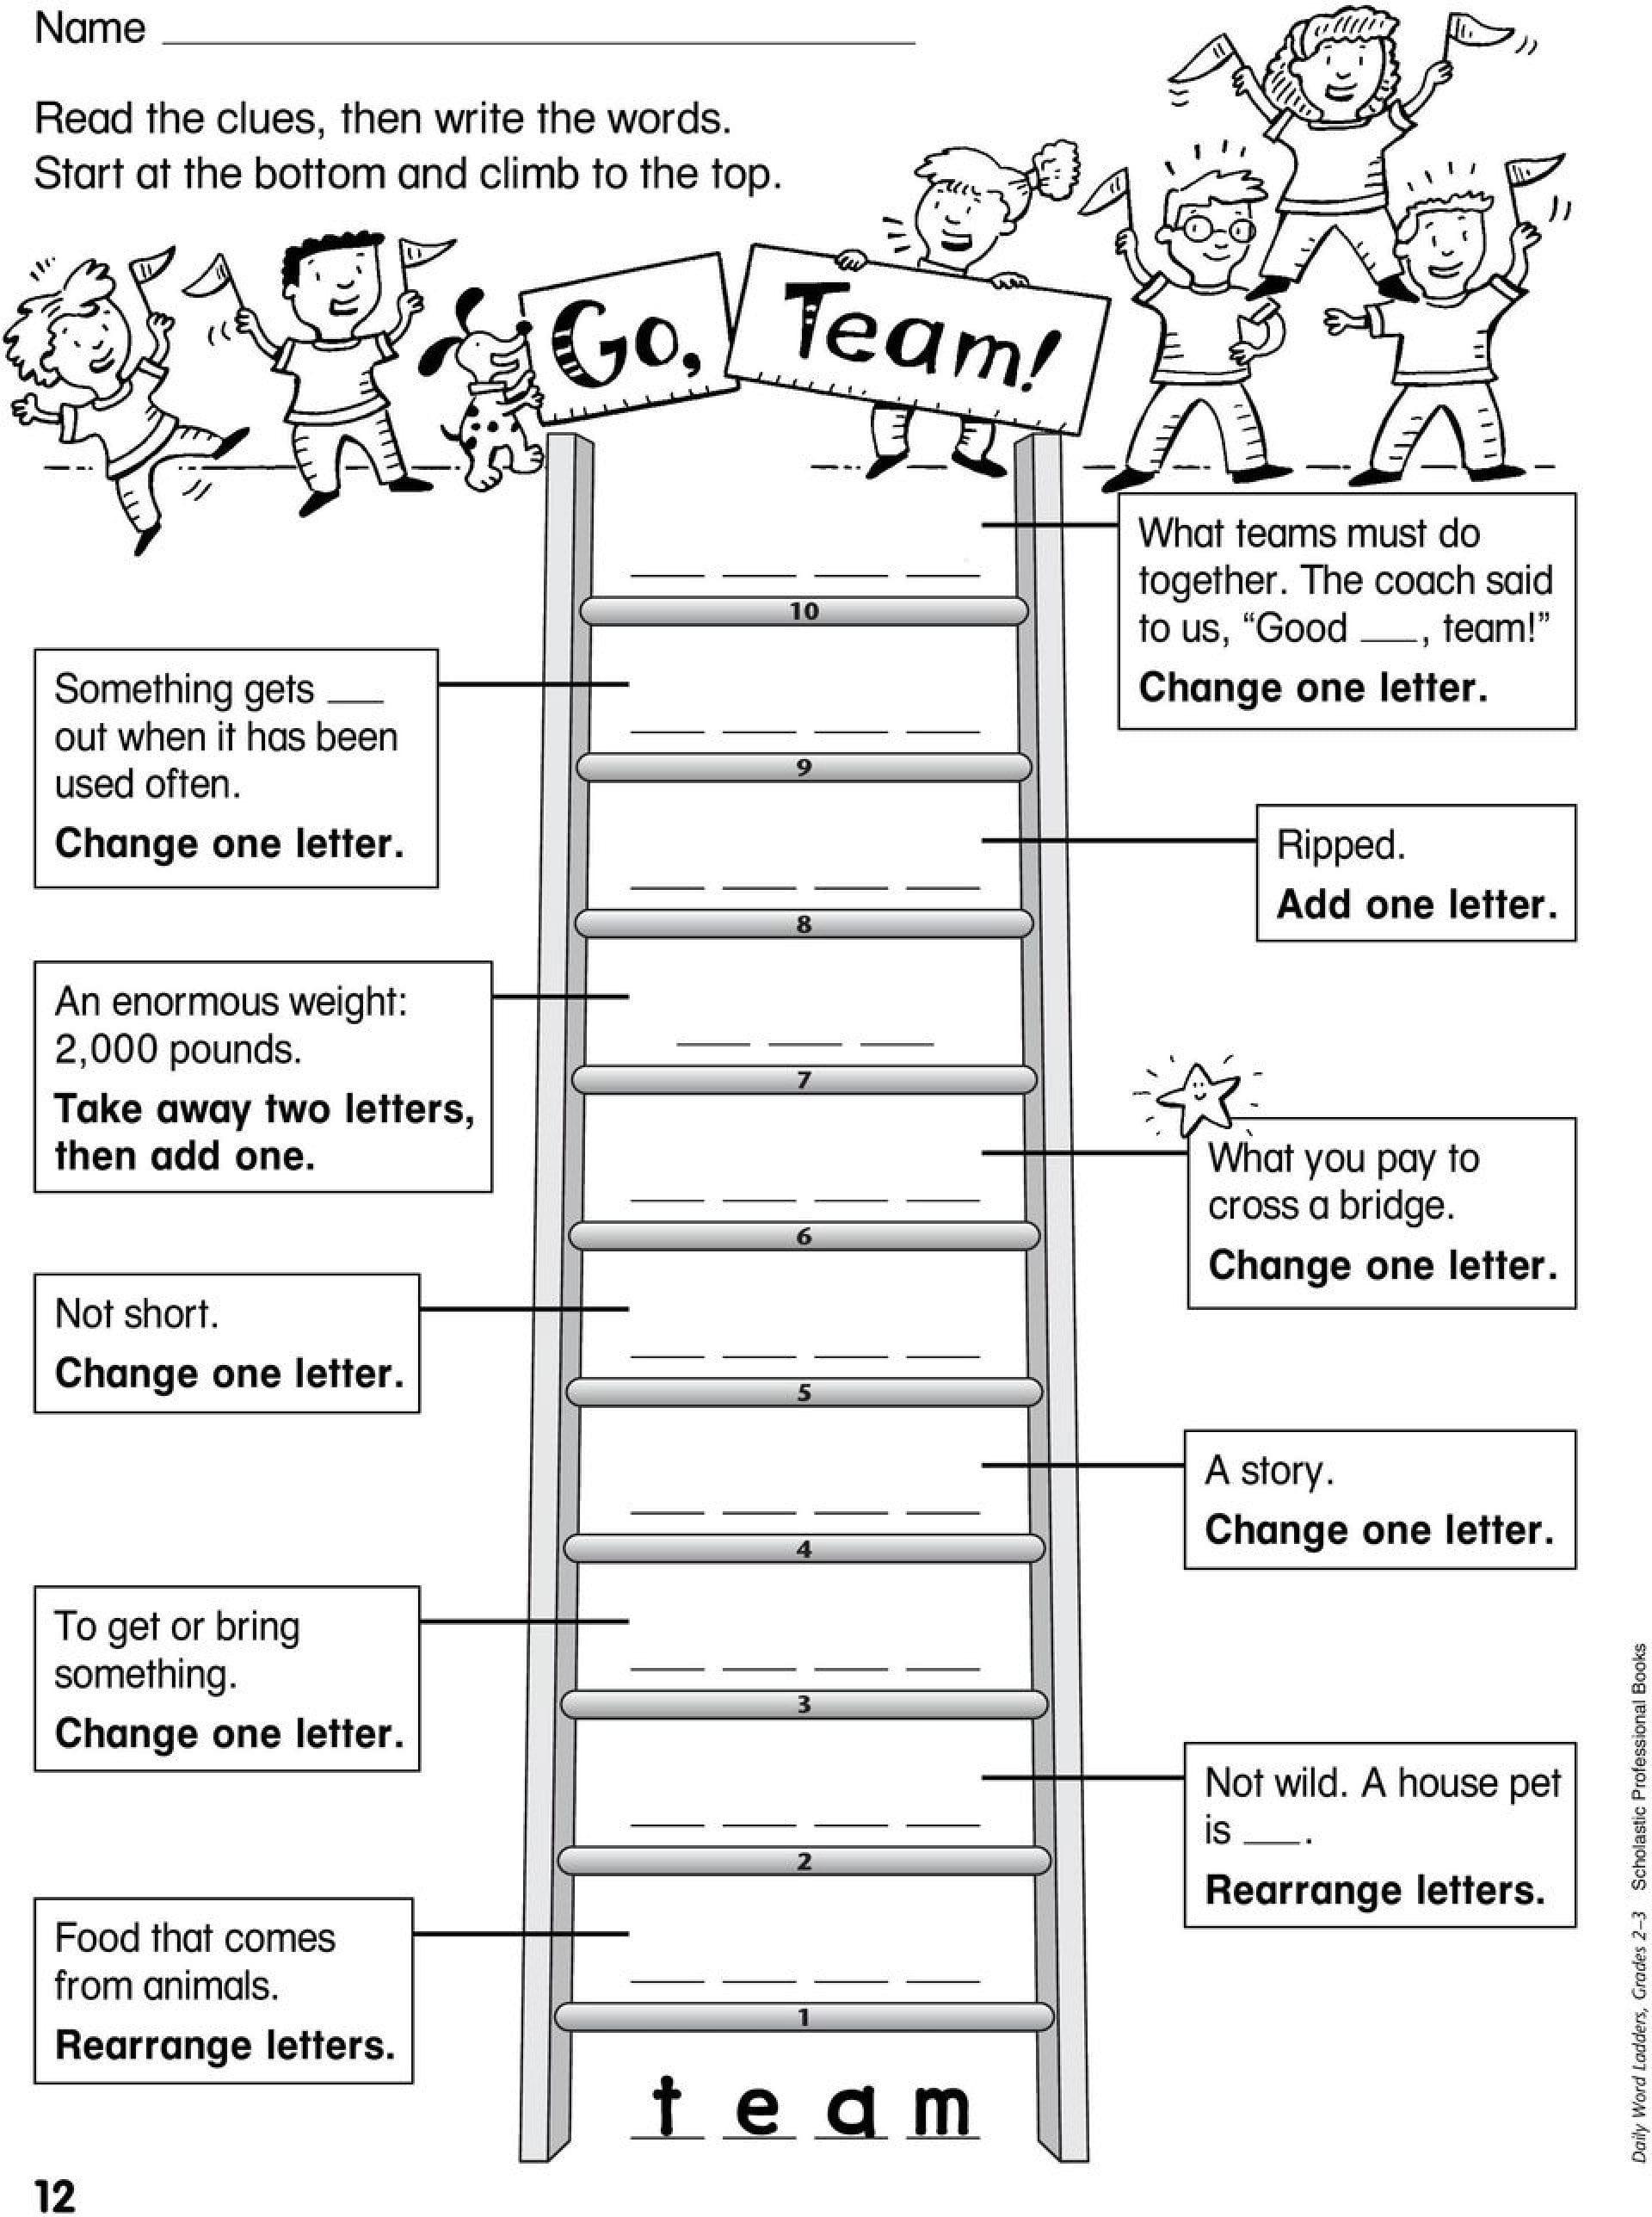 017 Printable Word Ladders Middle School Excellent  Istherewhitesmoke Regarding Word Ladder Worksheets For Middle School